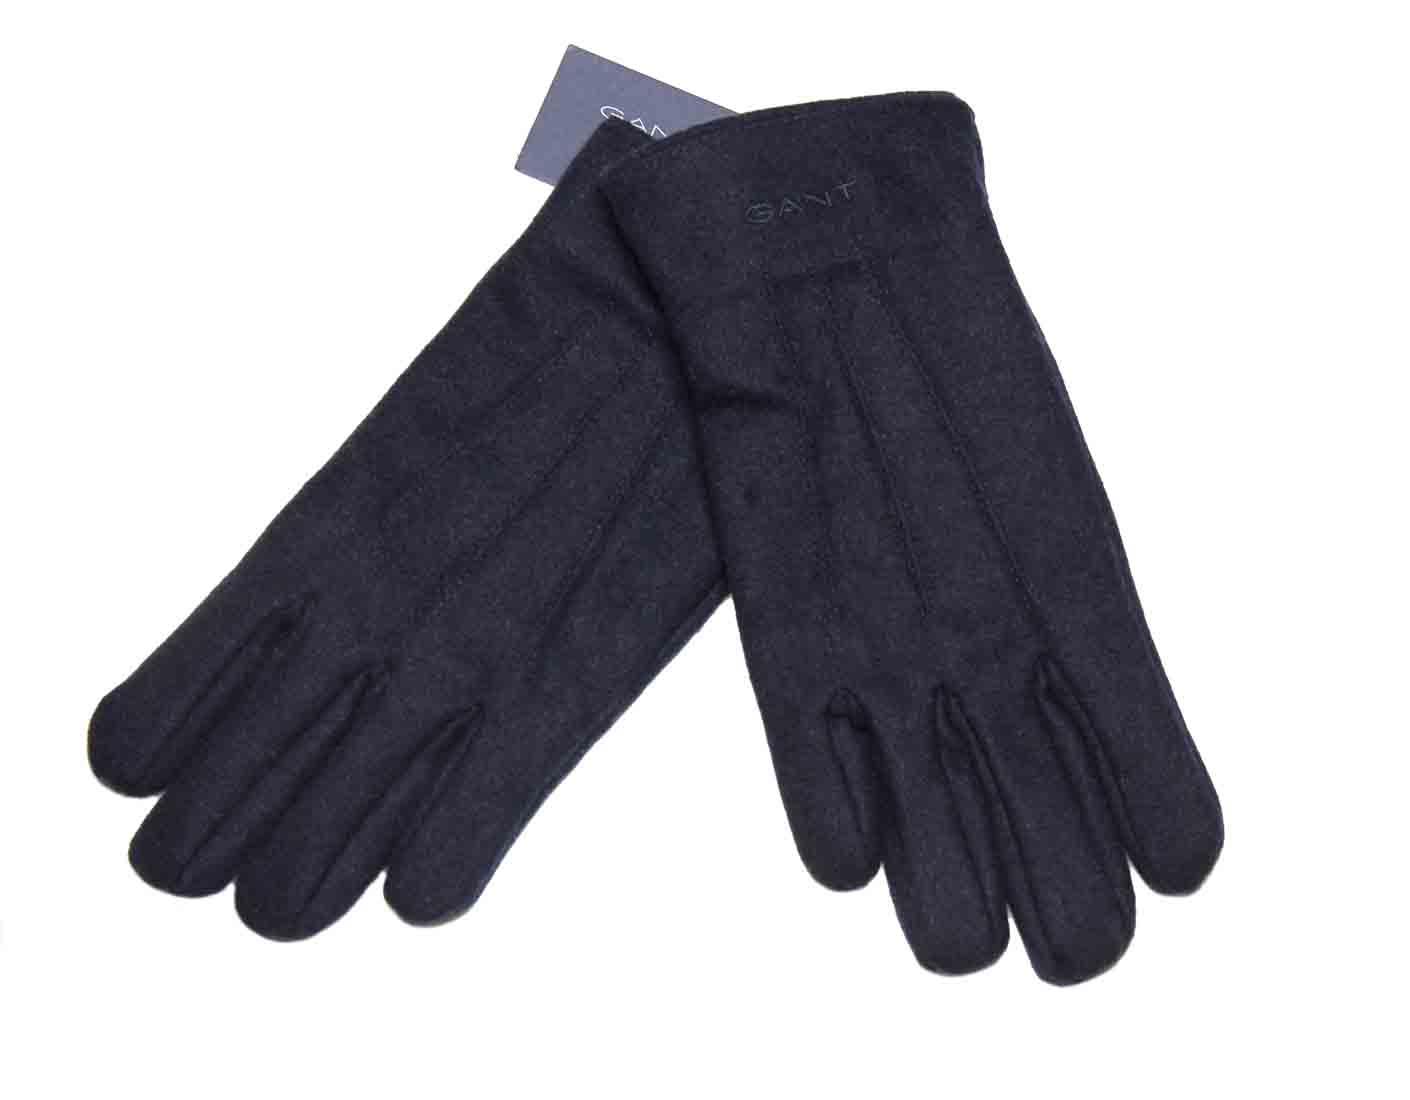 Gant Winter Gloves Wool Blend Men's Size Medium